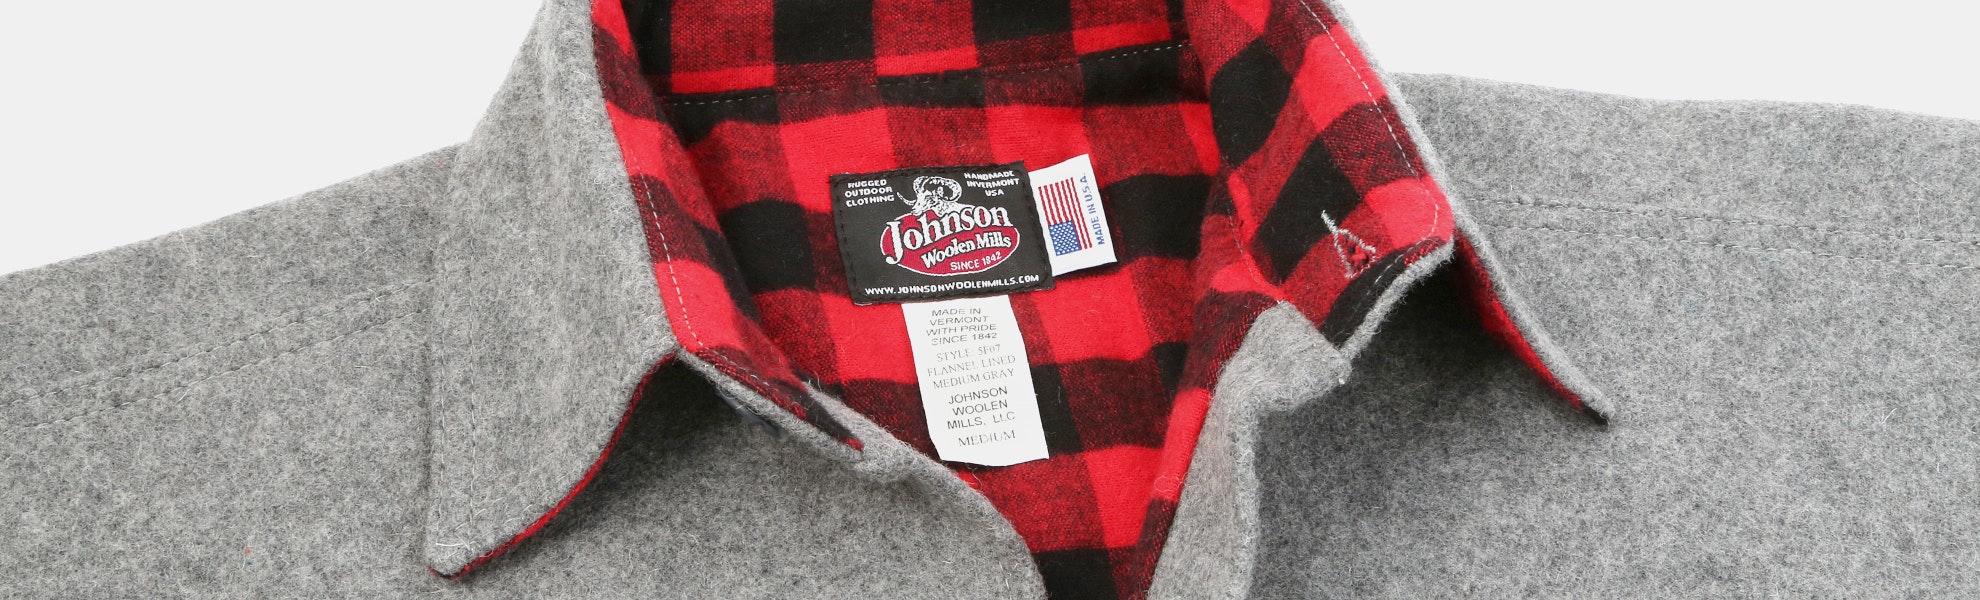 Johnson Woolen Mills Flannel-Lined Wool Shirt